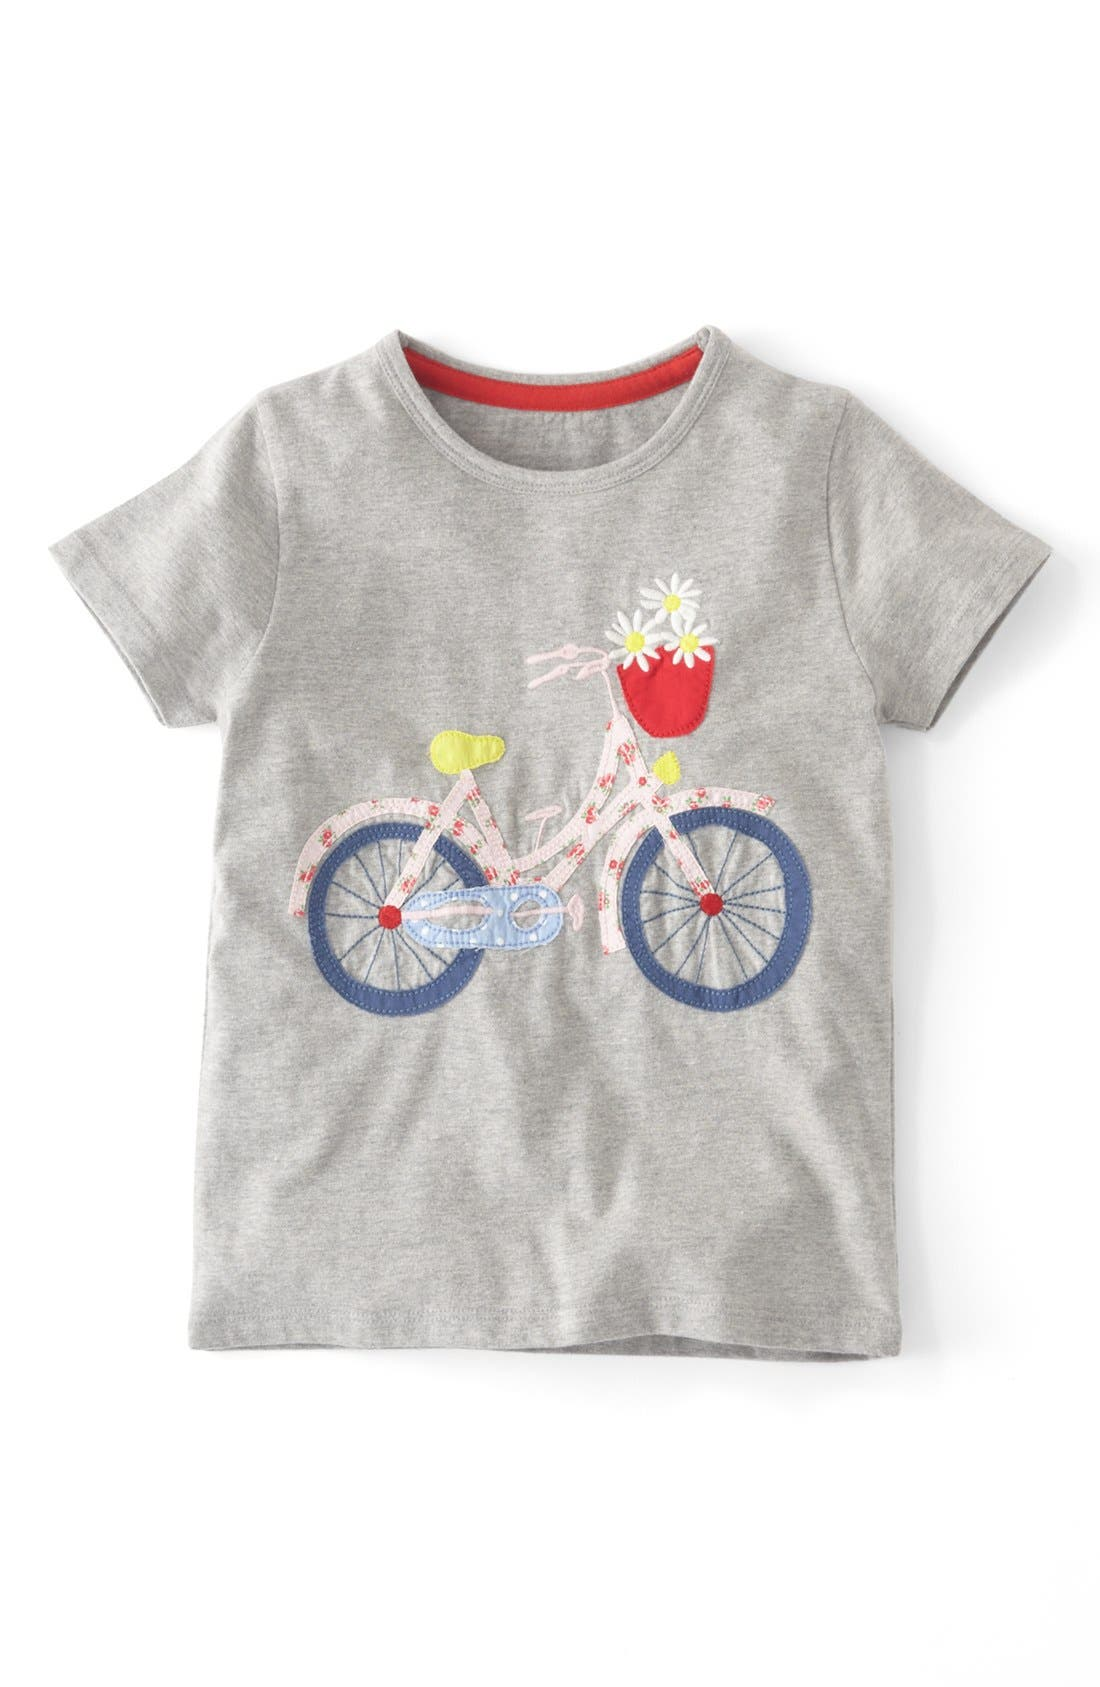 Main Image - Mini Boden Patchwork Appliqué Tee (Toddler Girls, Little Girls & Big Girls)(Online Only)